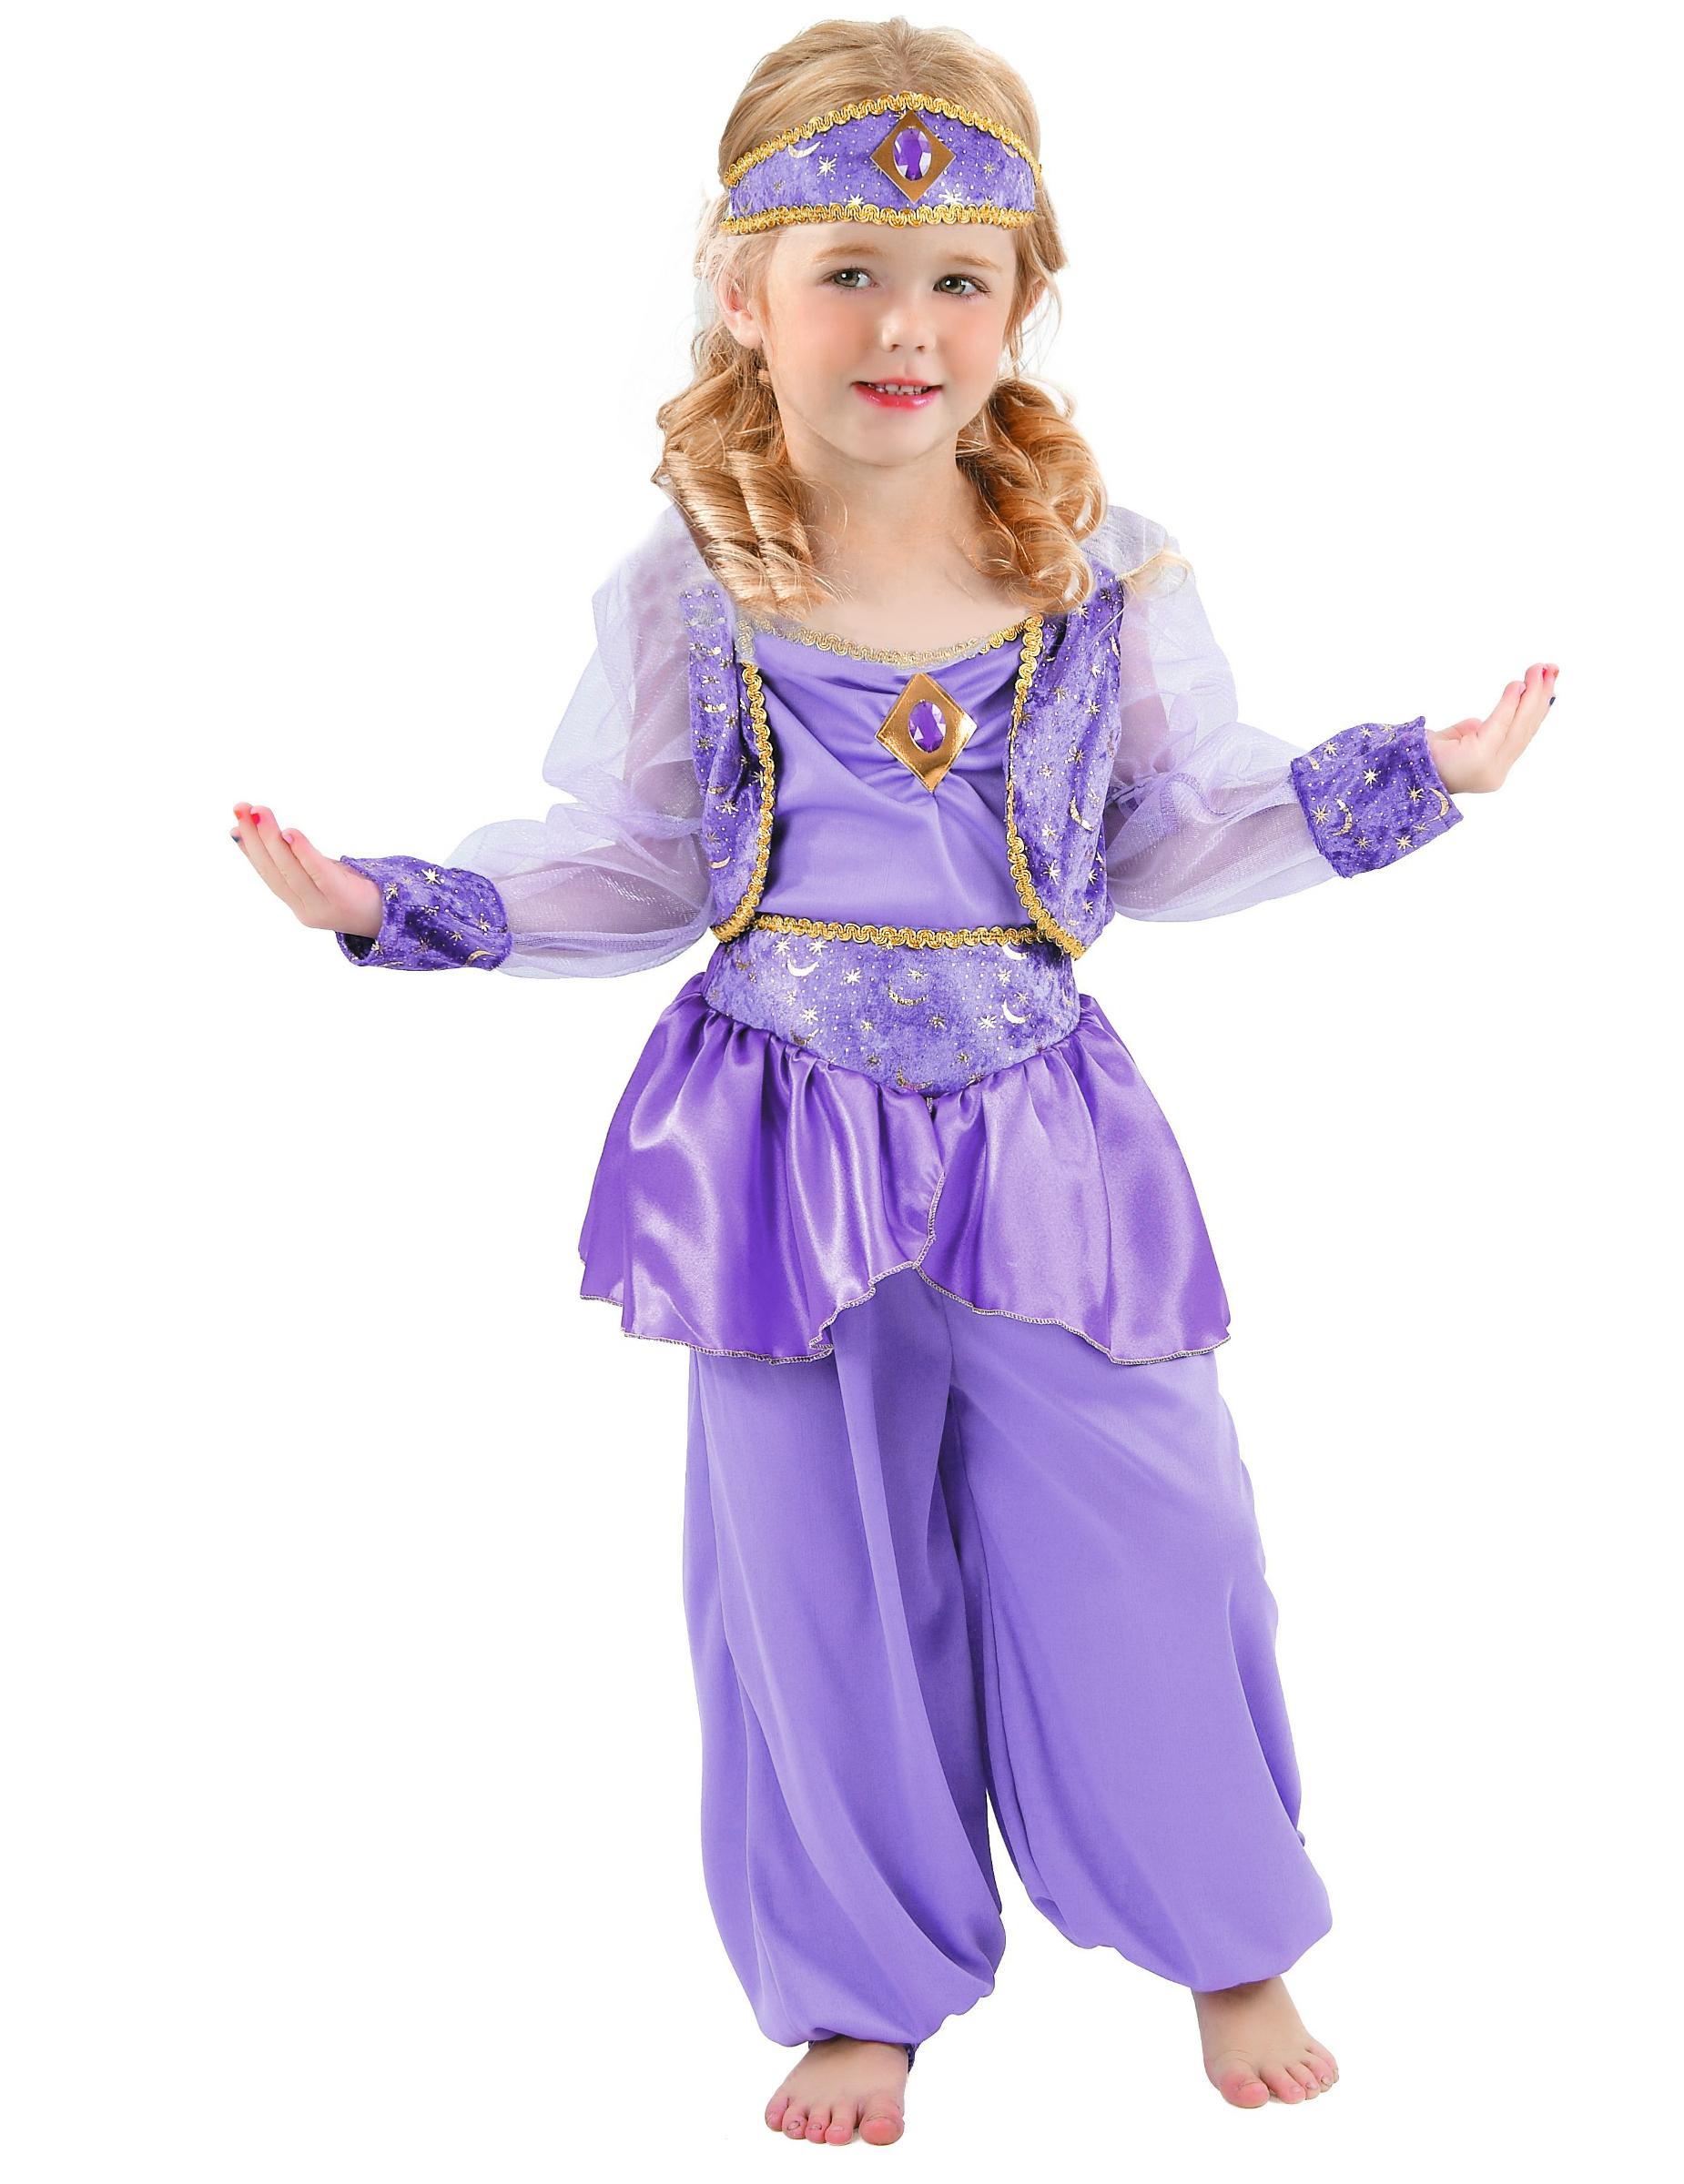 Orientalische Tanzerin Kinderkostum Lila Gold Gunstige Faschings